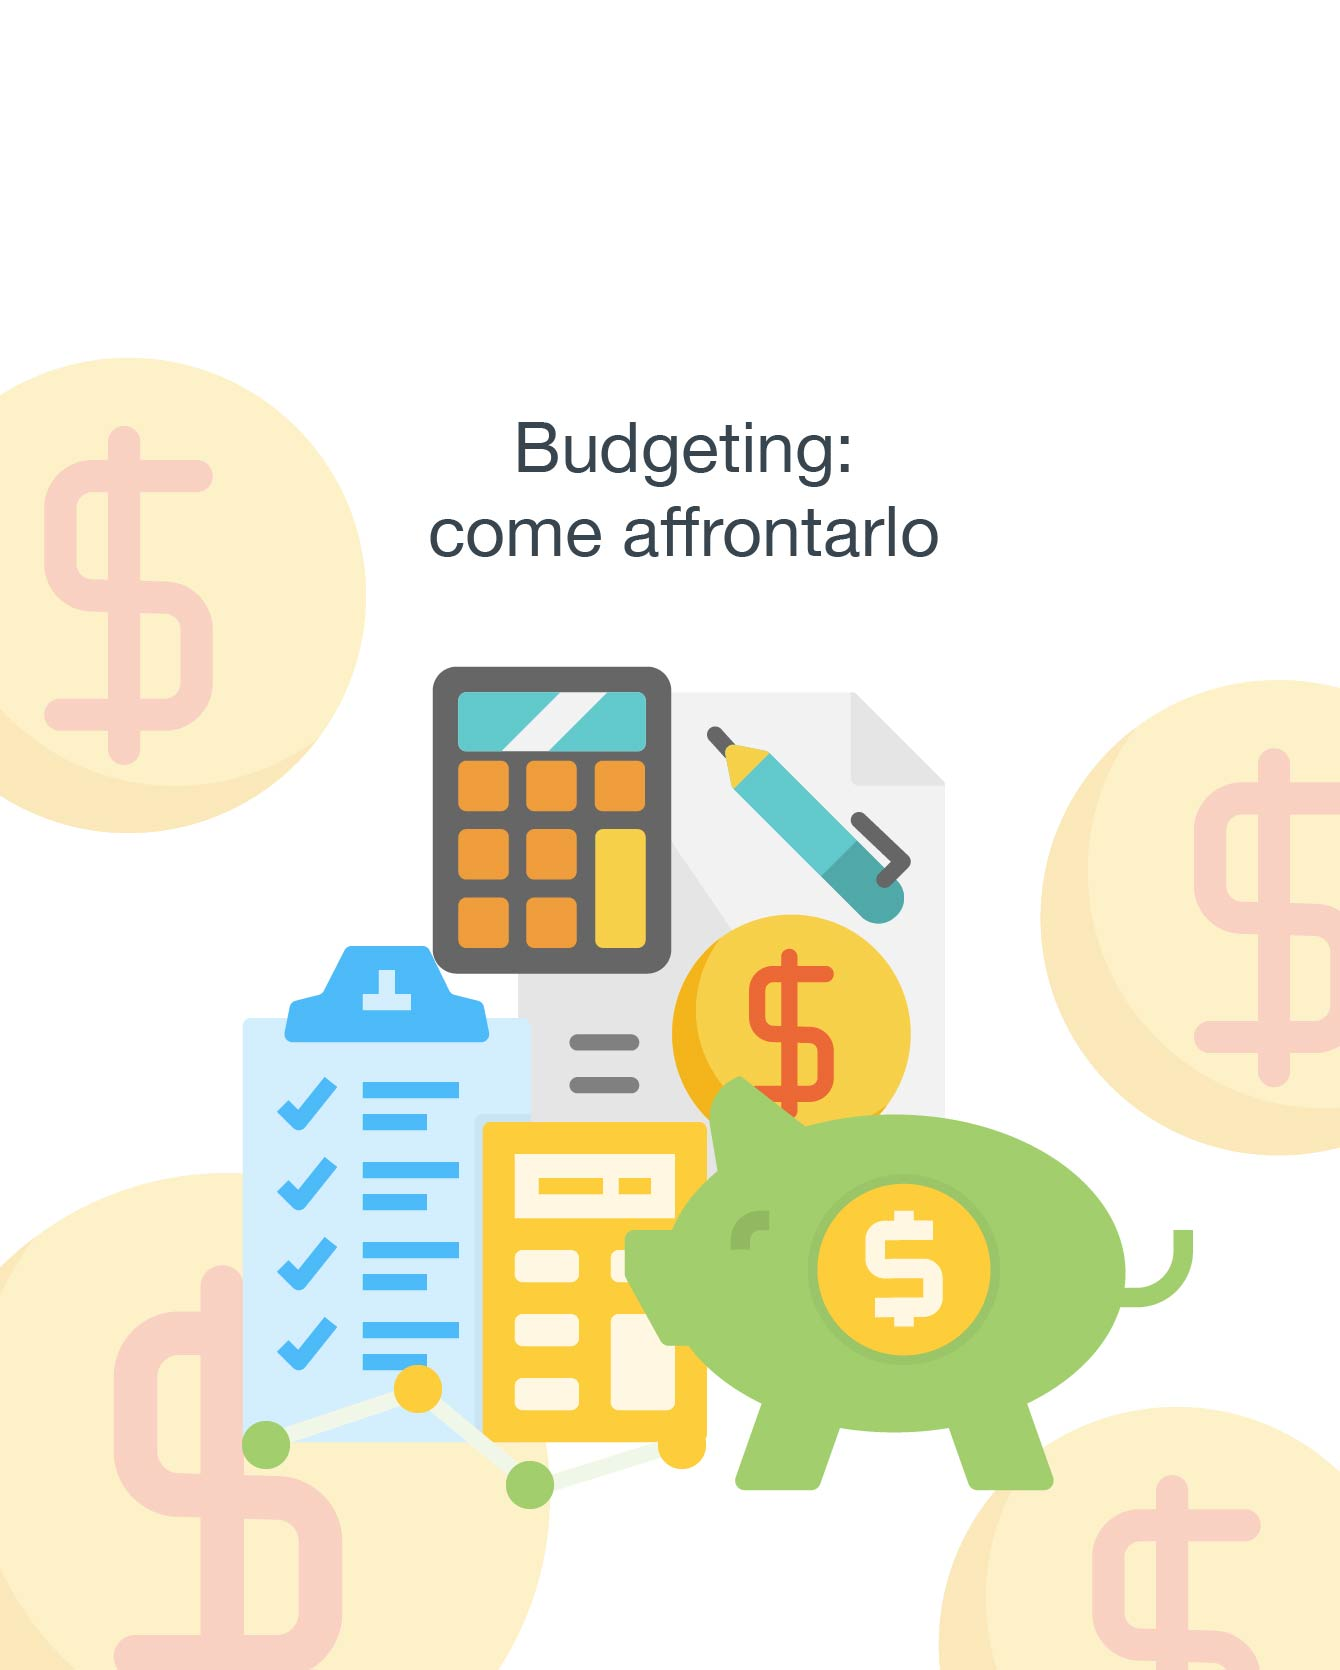 Budgeting: come affrontarlo in maniera efficace